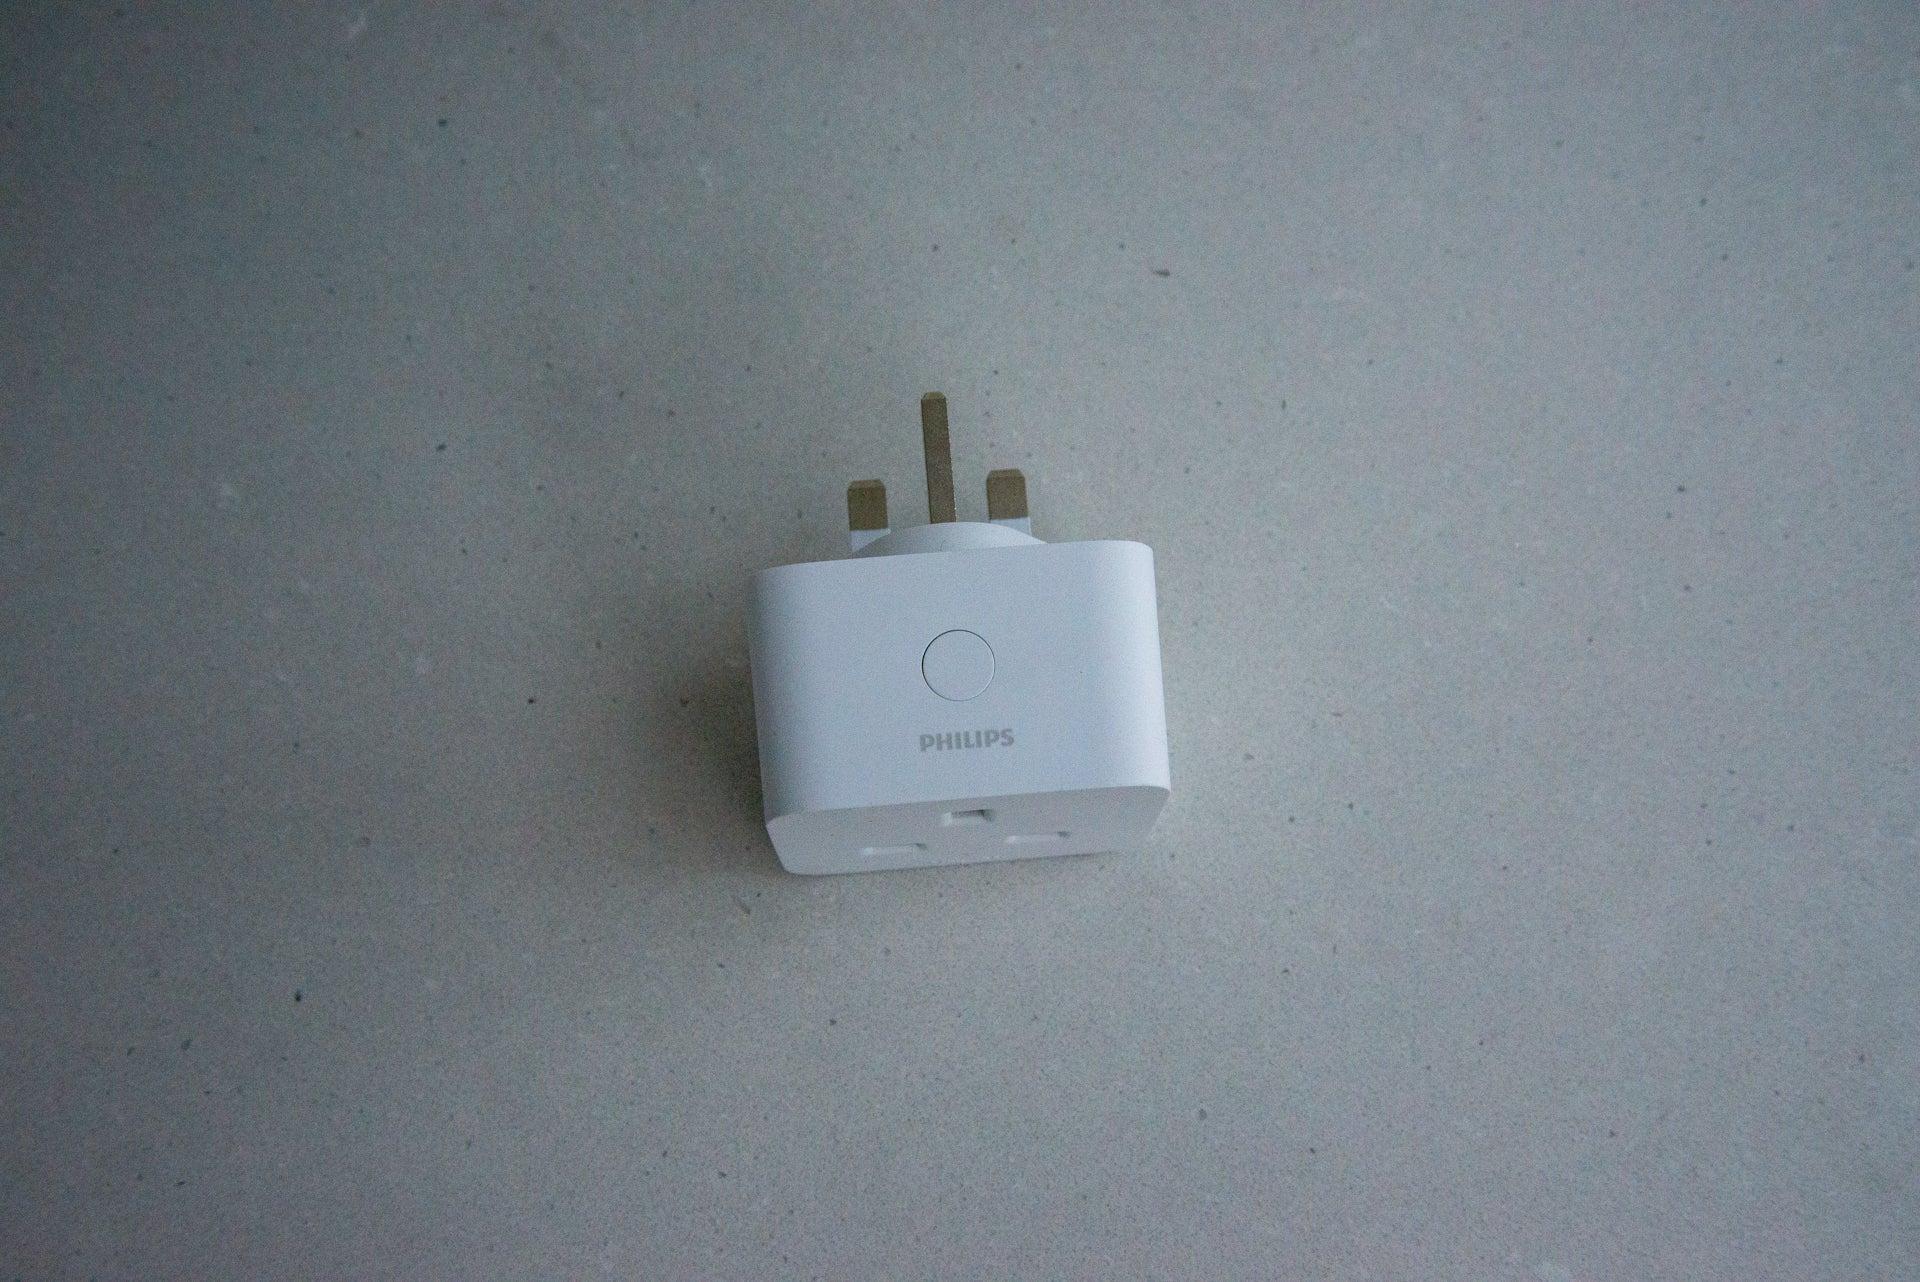 Philips Hue Smart Plug power button